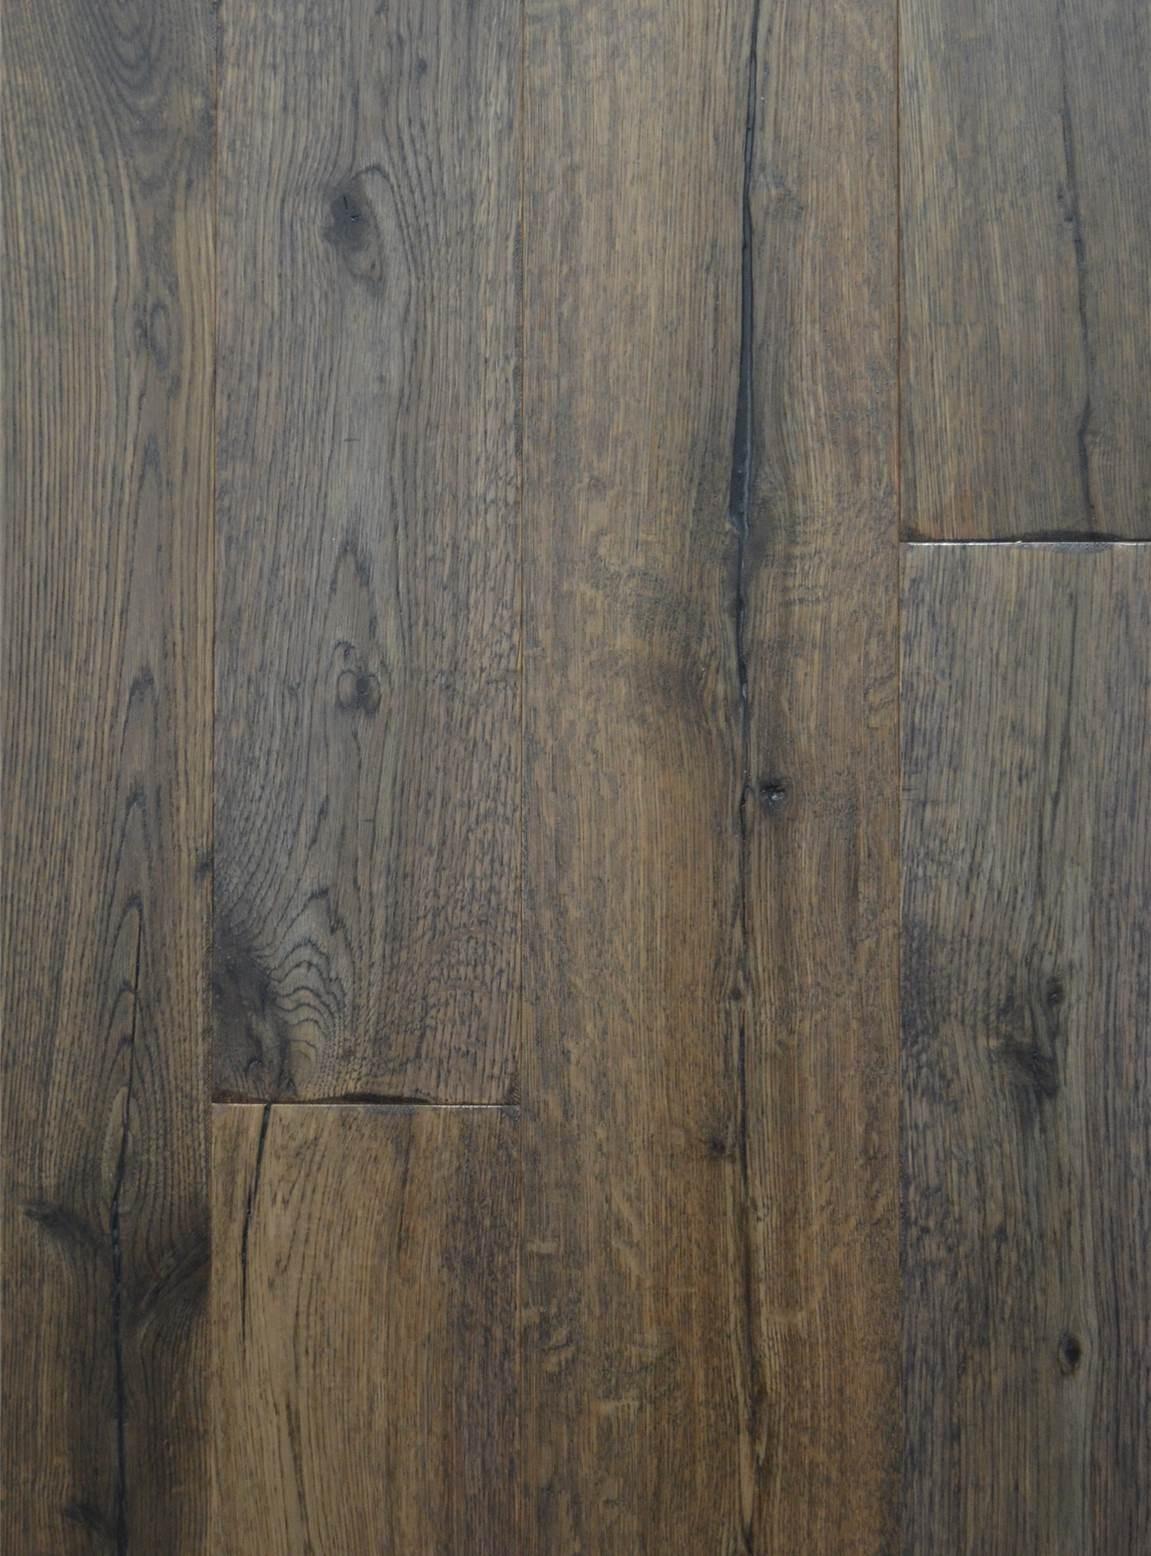 Glenbury Collection Lm Flooring